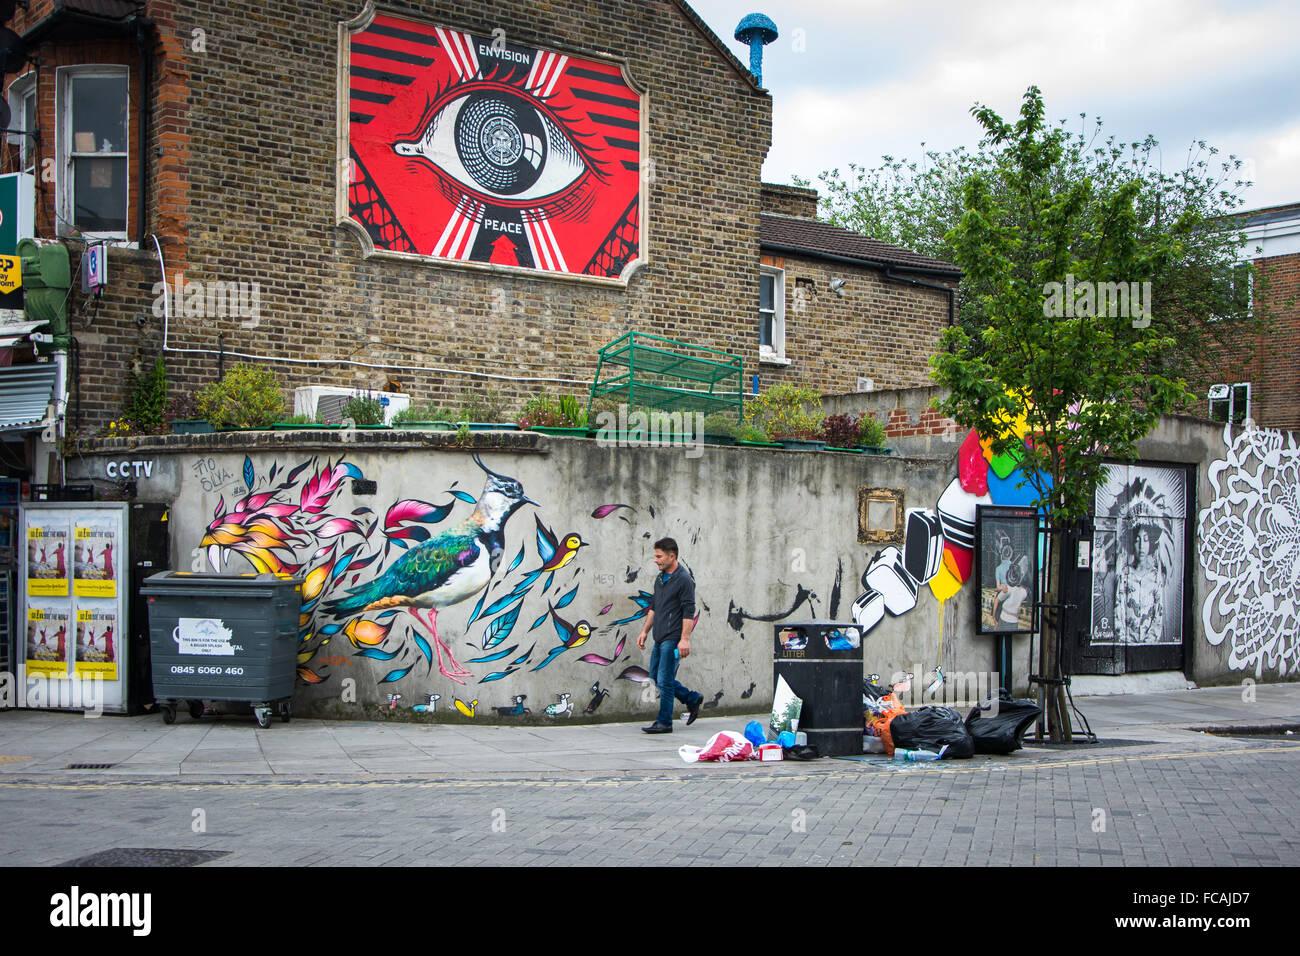 Street Art in Turnpike Lane, Haringey, North London - Stock Image